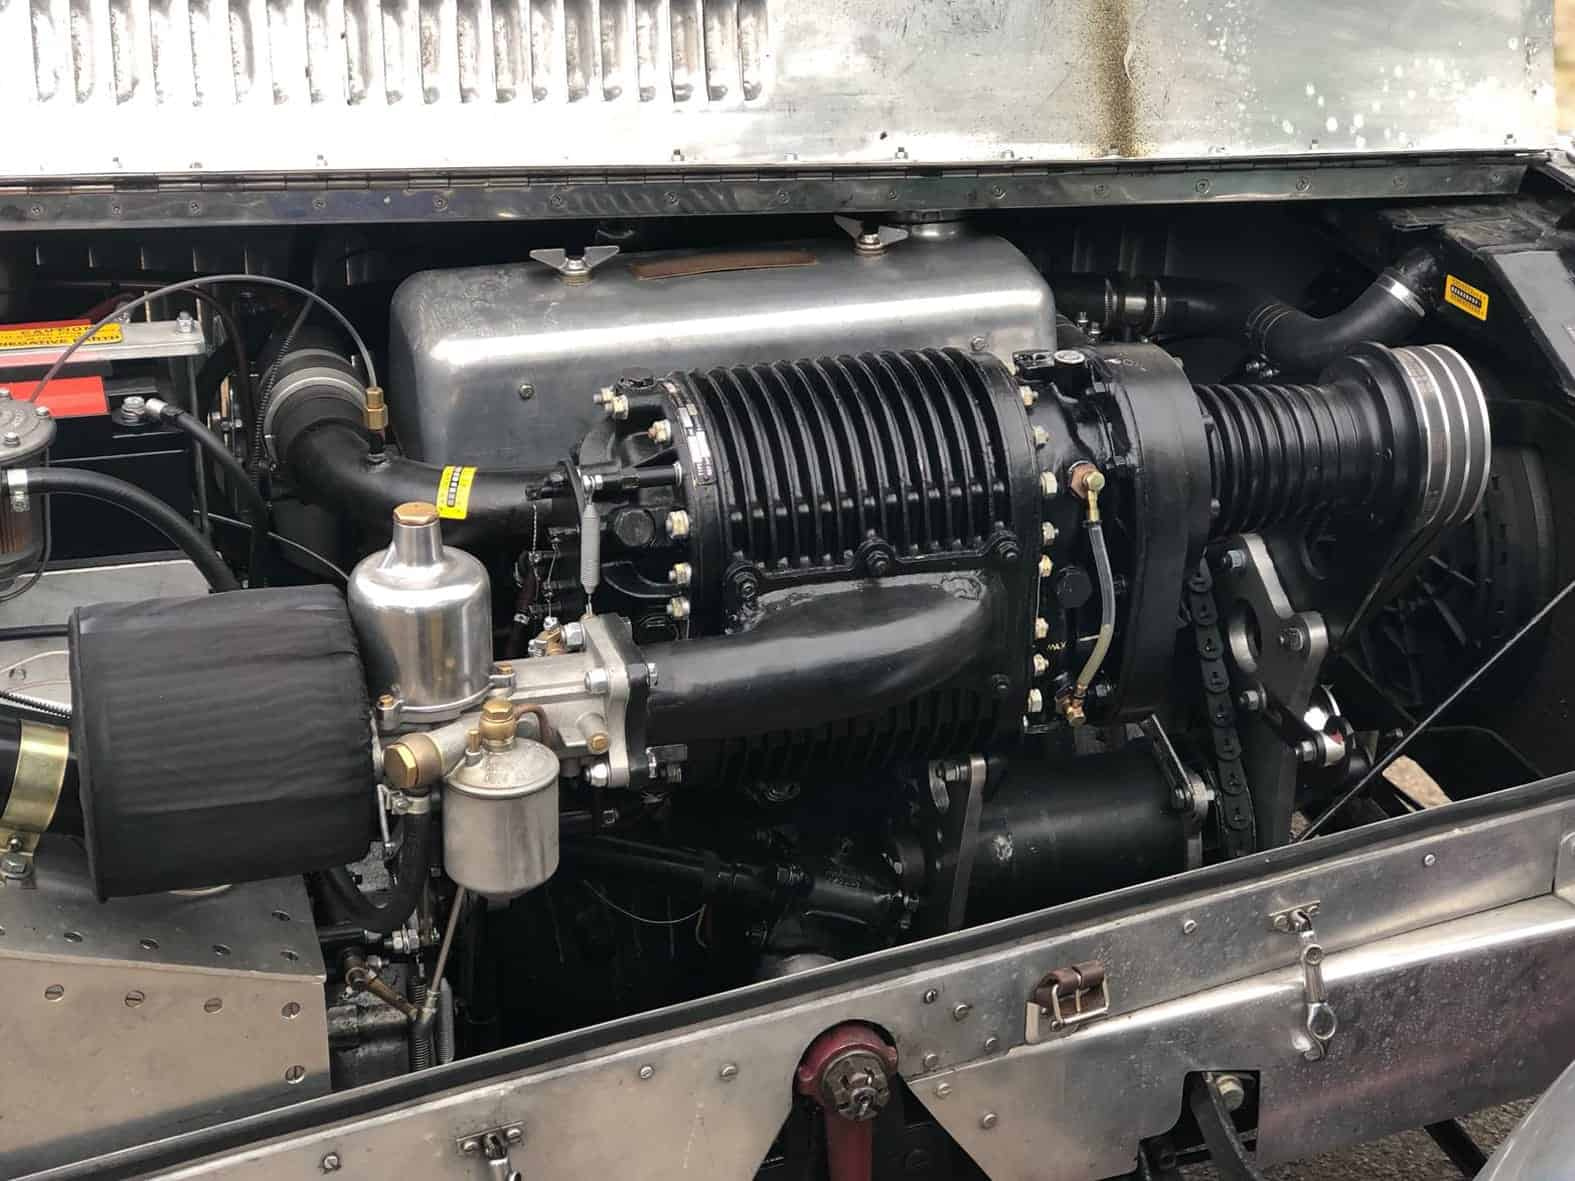 Austin Harley Saloon engine